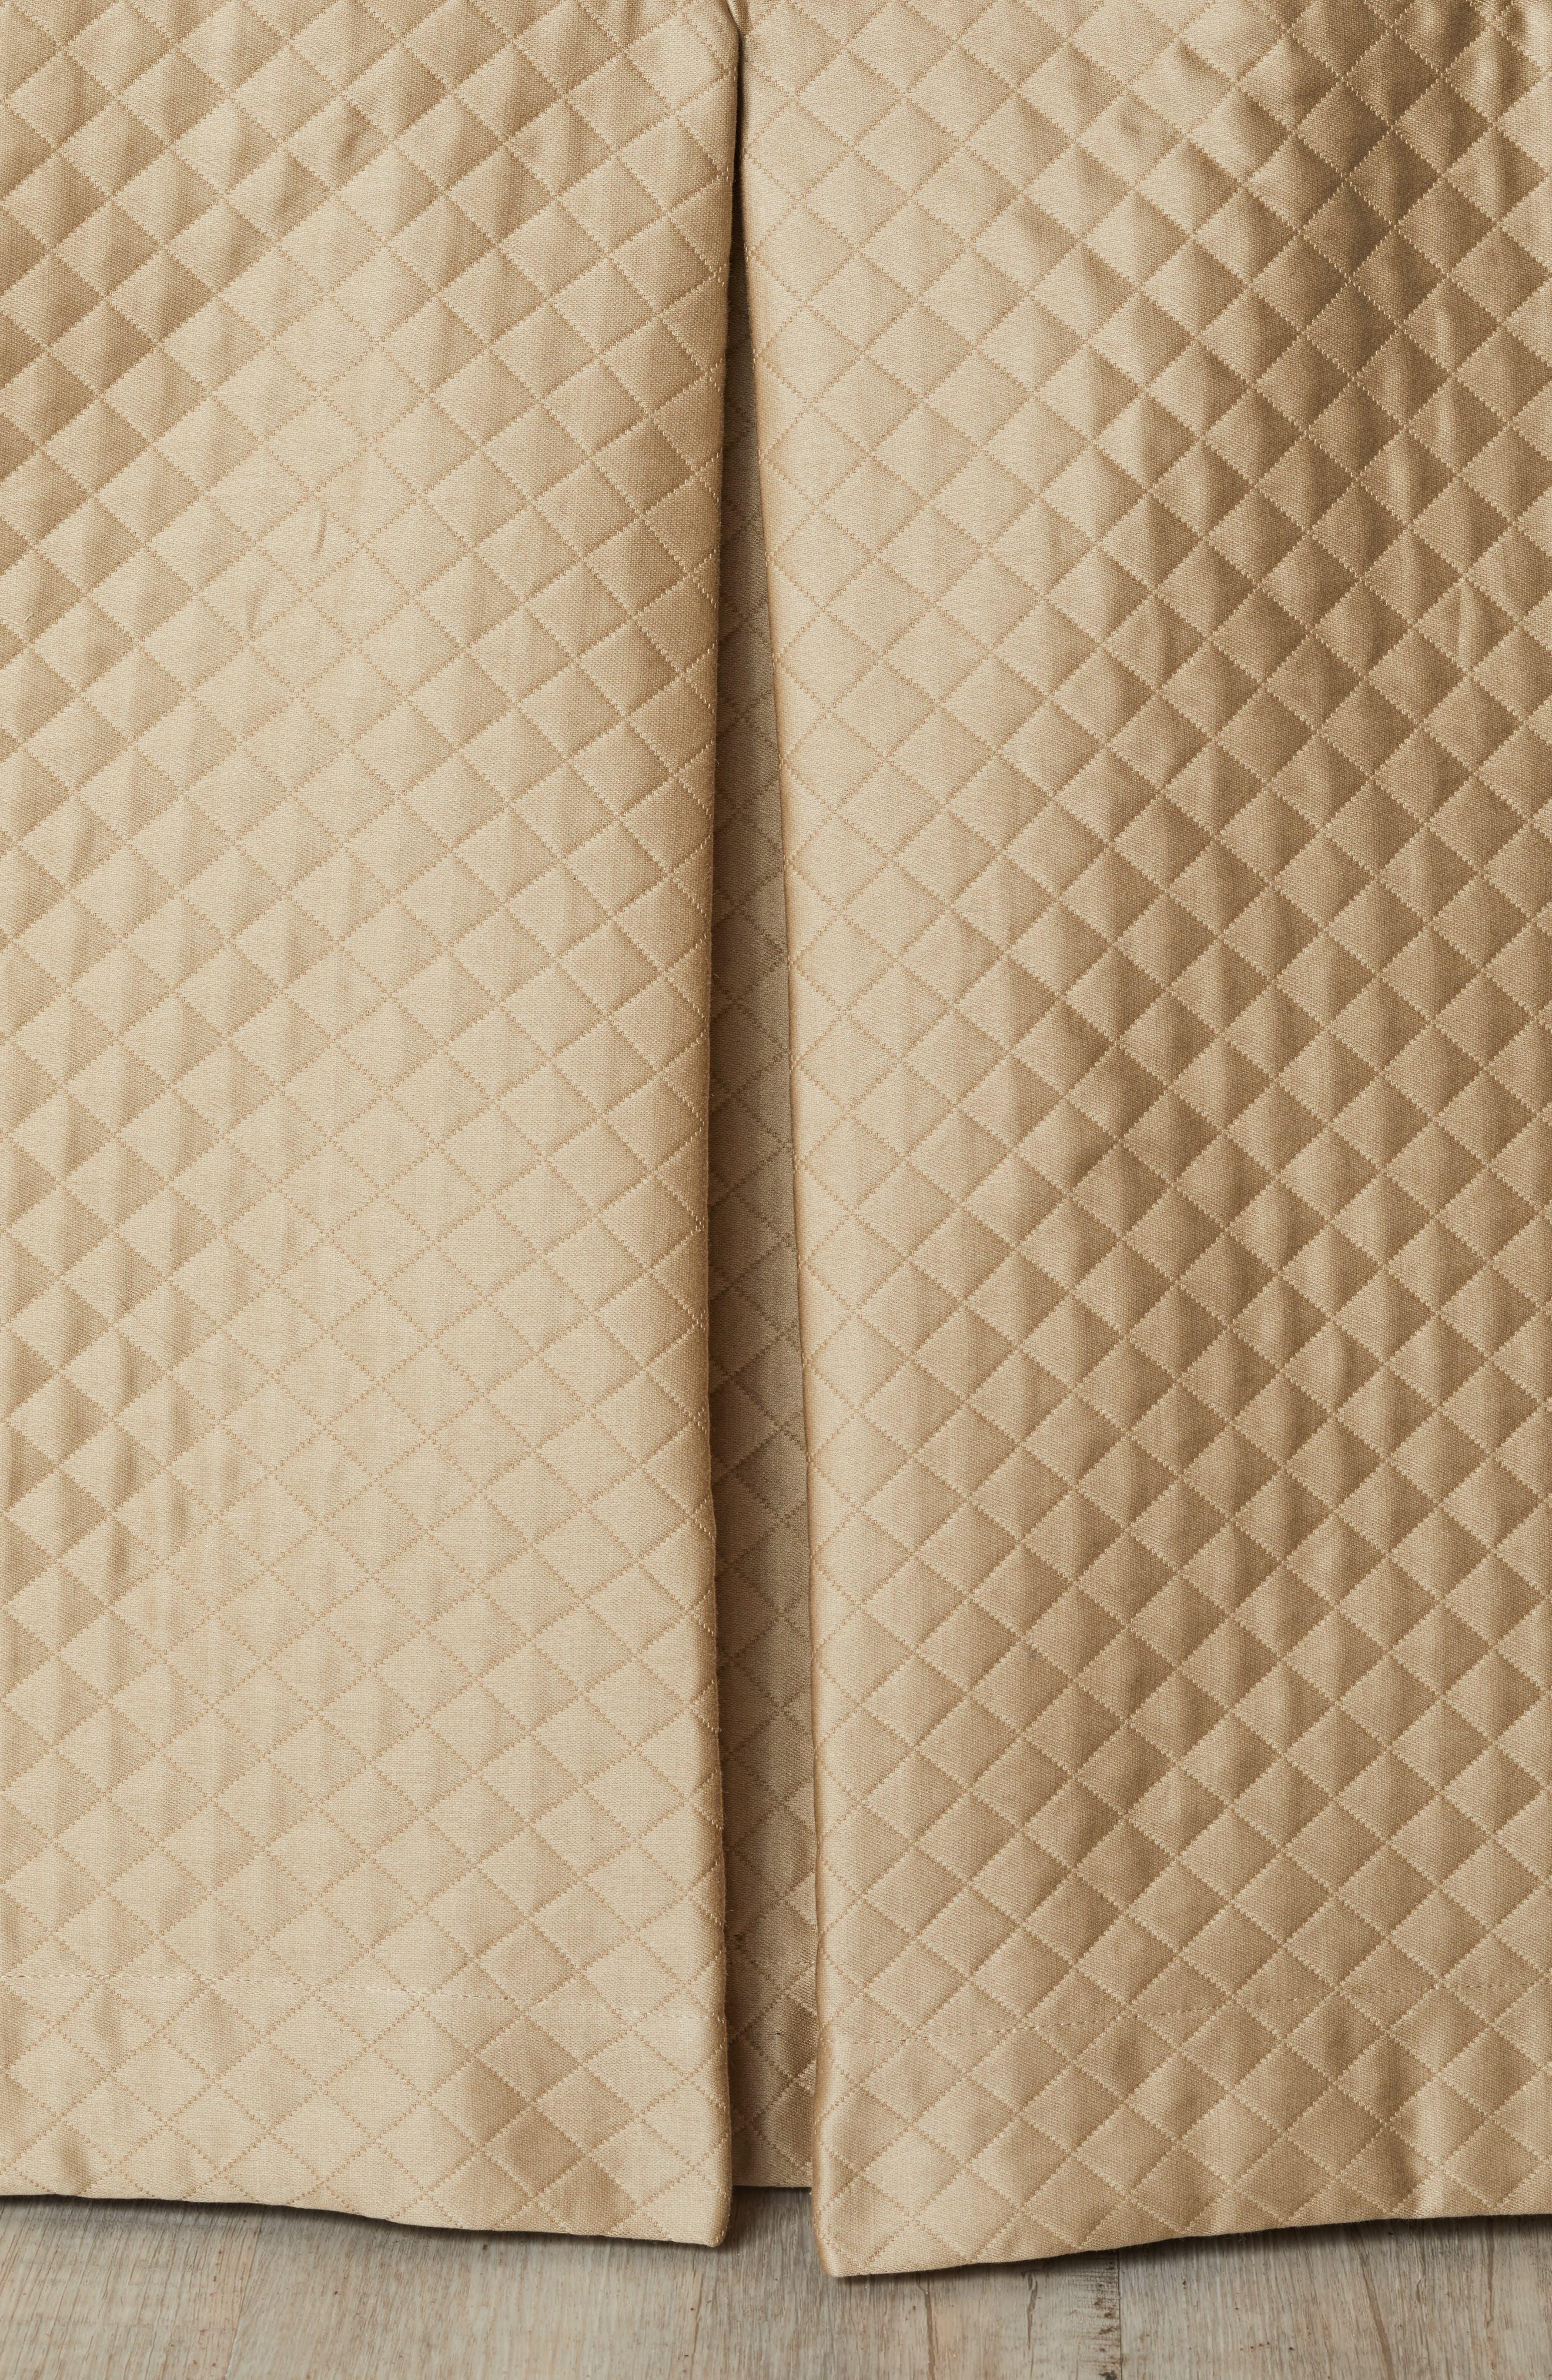 Bari Dust Ruffle,                             Main thumbnail 1, color,                             TAUPE